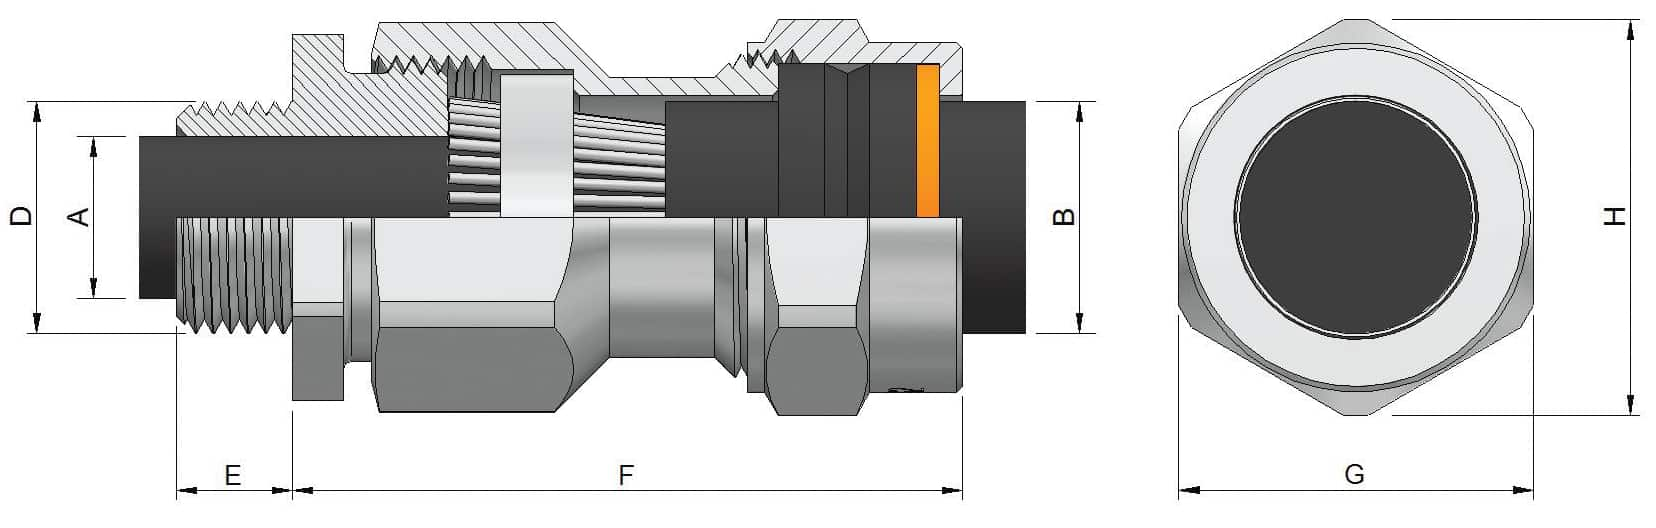 Aluminium Cable Glands Prysmian Bicon Ka422 Cw Wiring Armoured Gland Kits Awa Wire